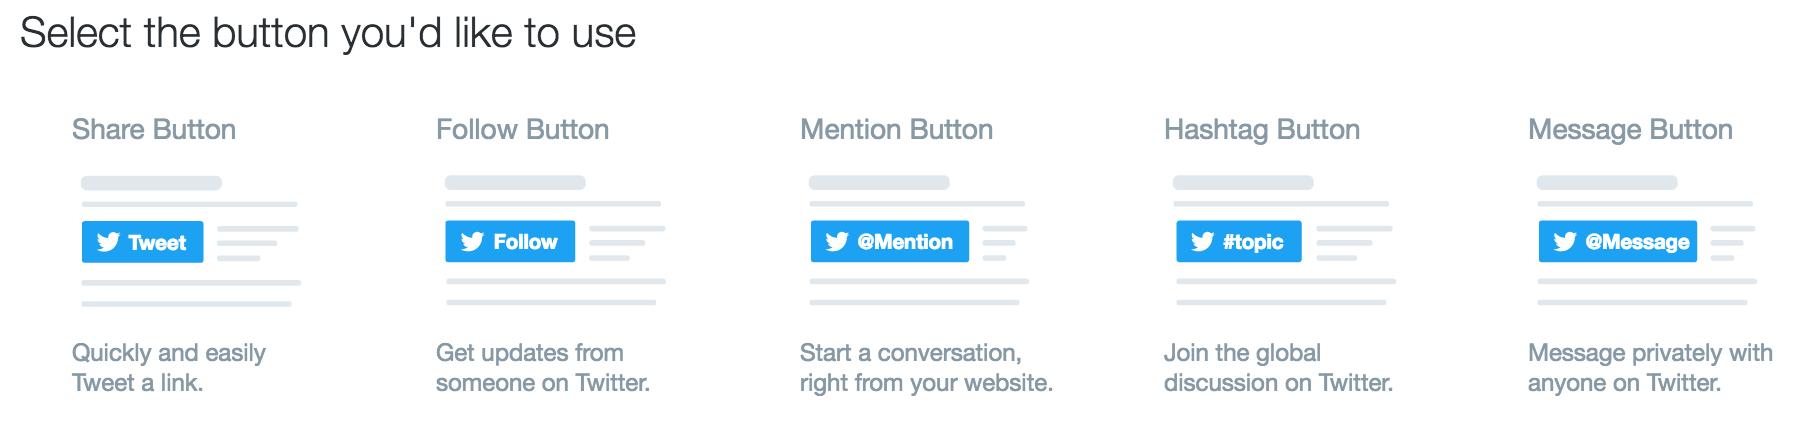 twitter create tweet message dm button